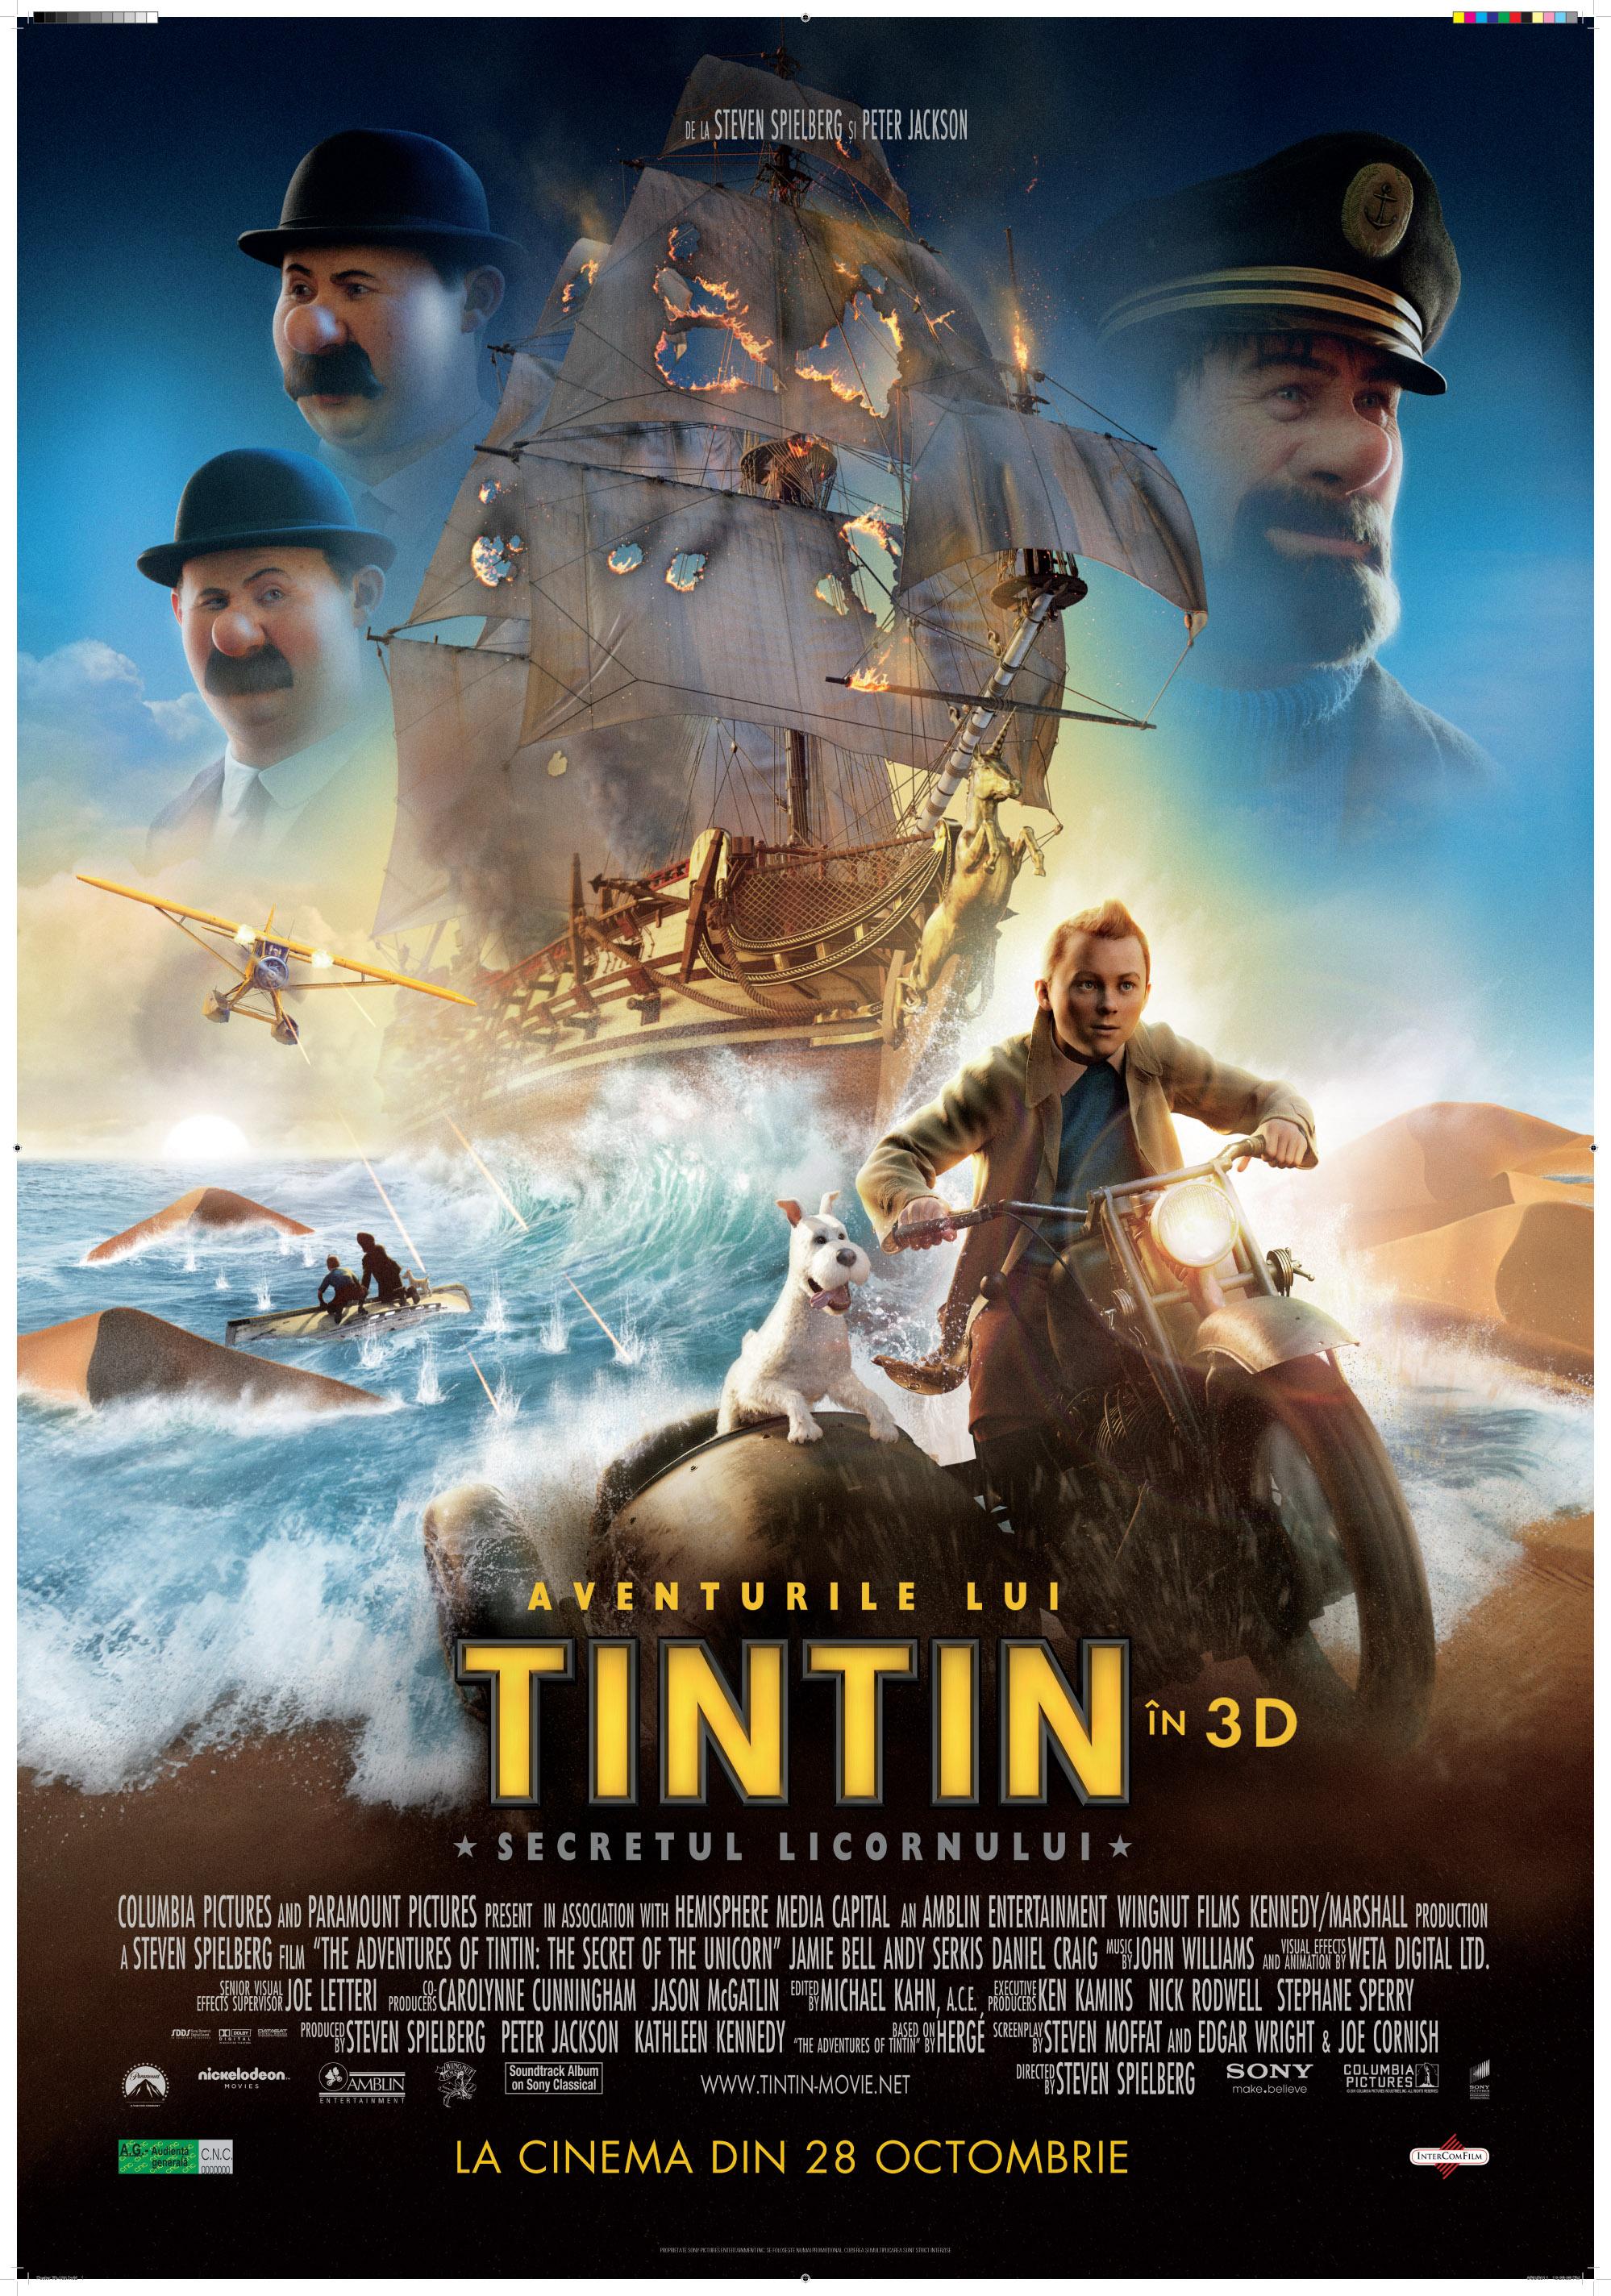 Te trimit la Aventurile lui TinTin in 3D la IMAX Cotroceni